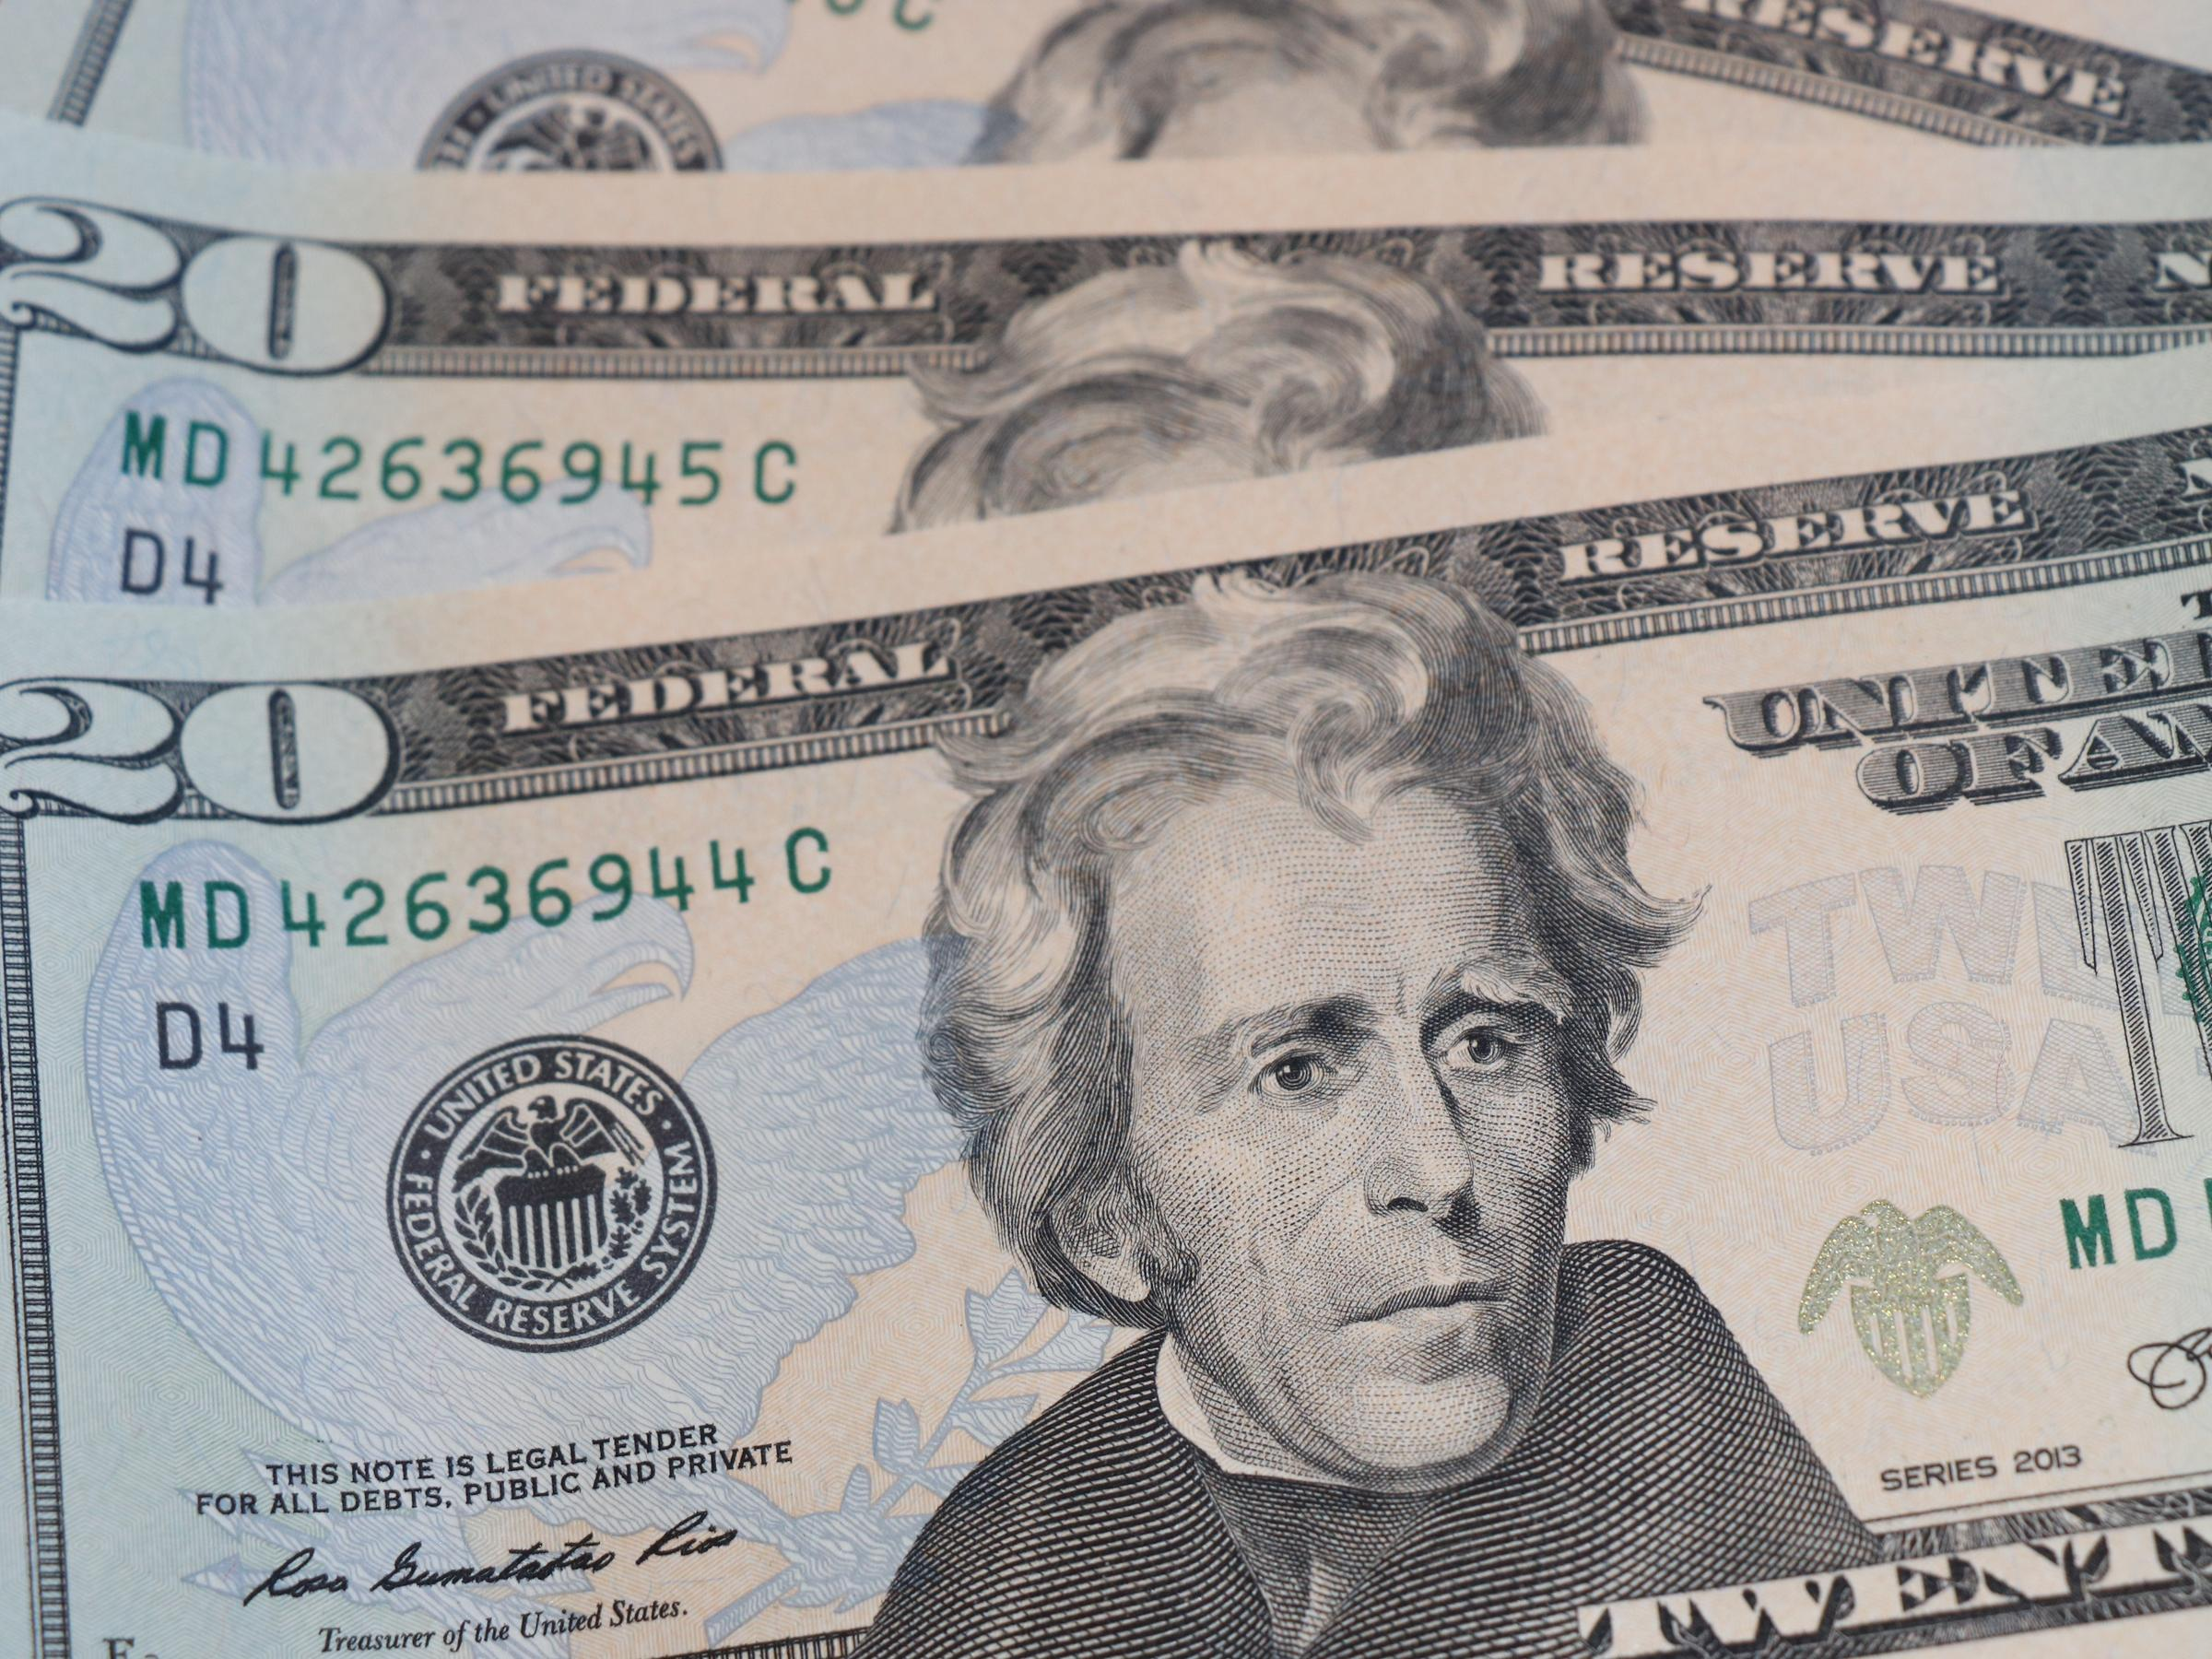 General Andrew Jackson Apush